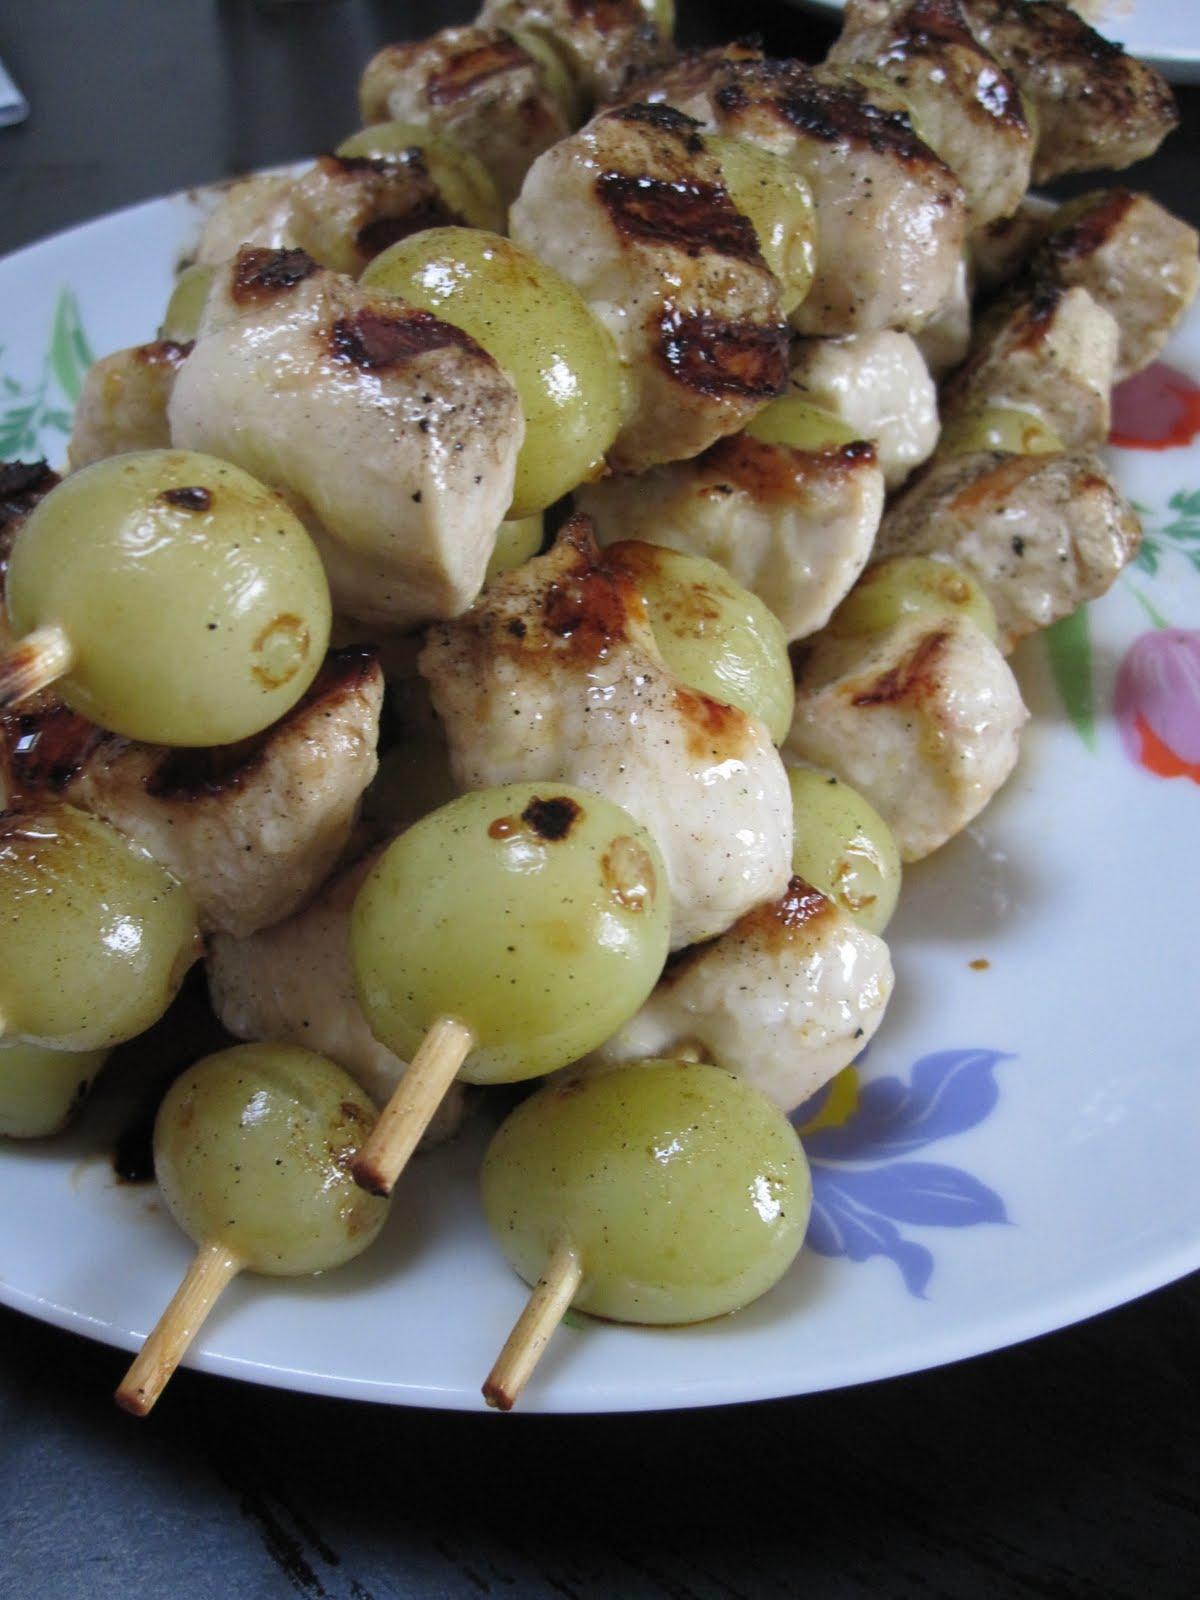 healthy-ish: Lemon-Garlic-Marinated Chicken and Grape Skewers